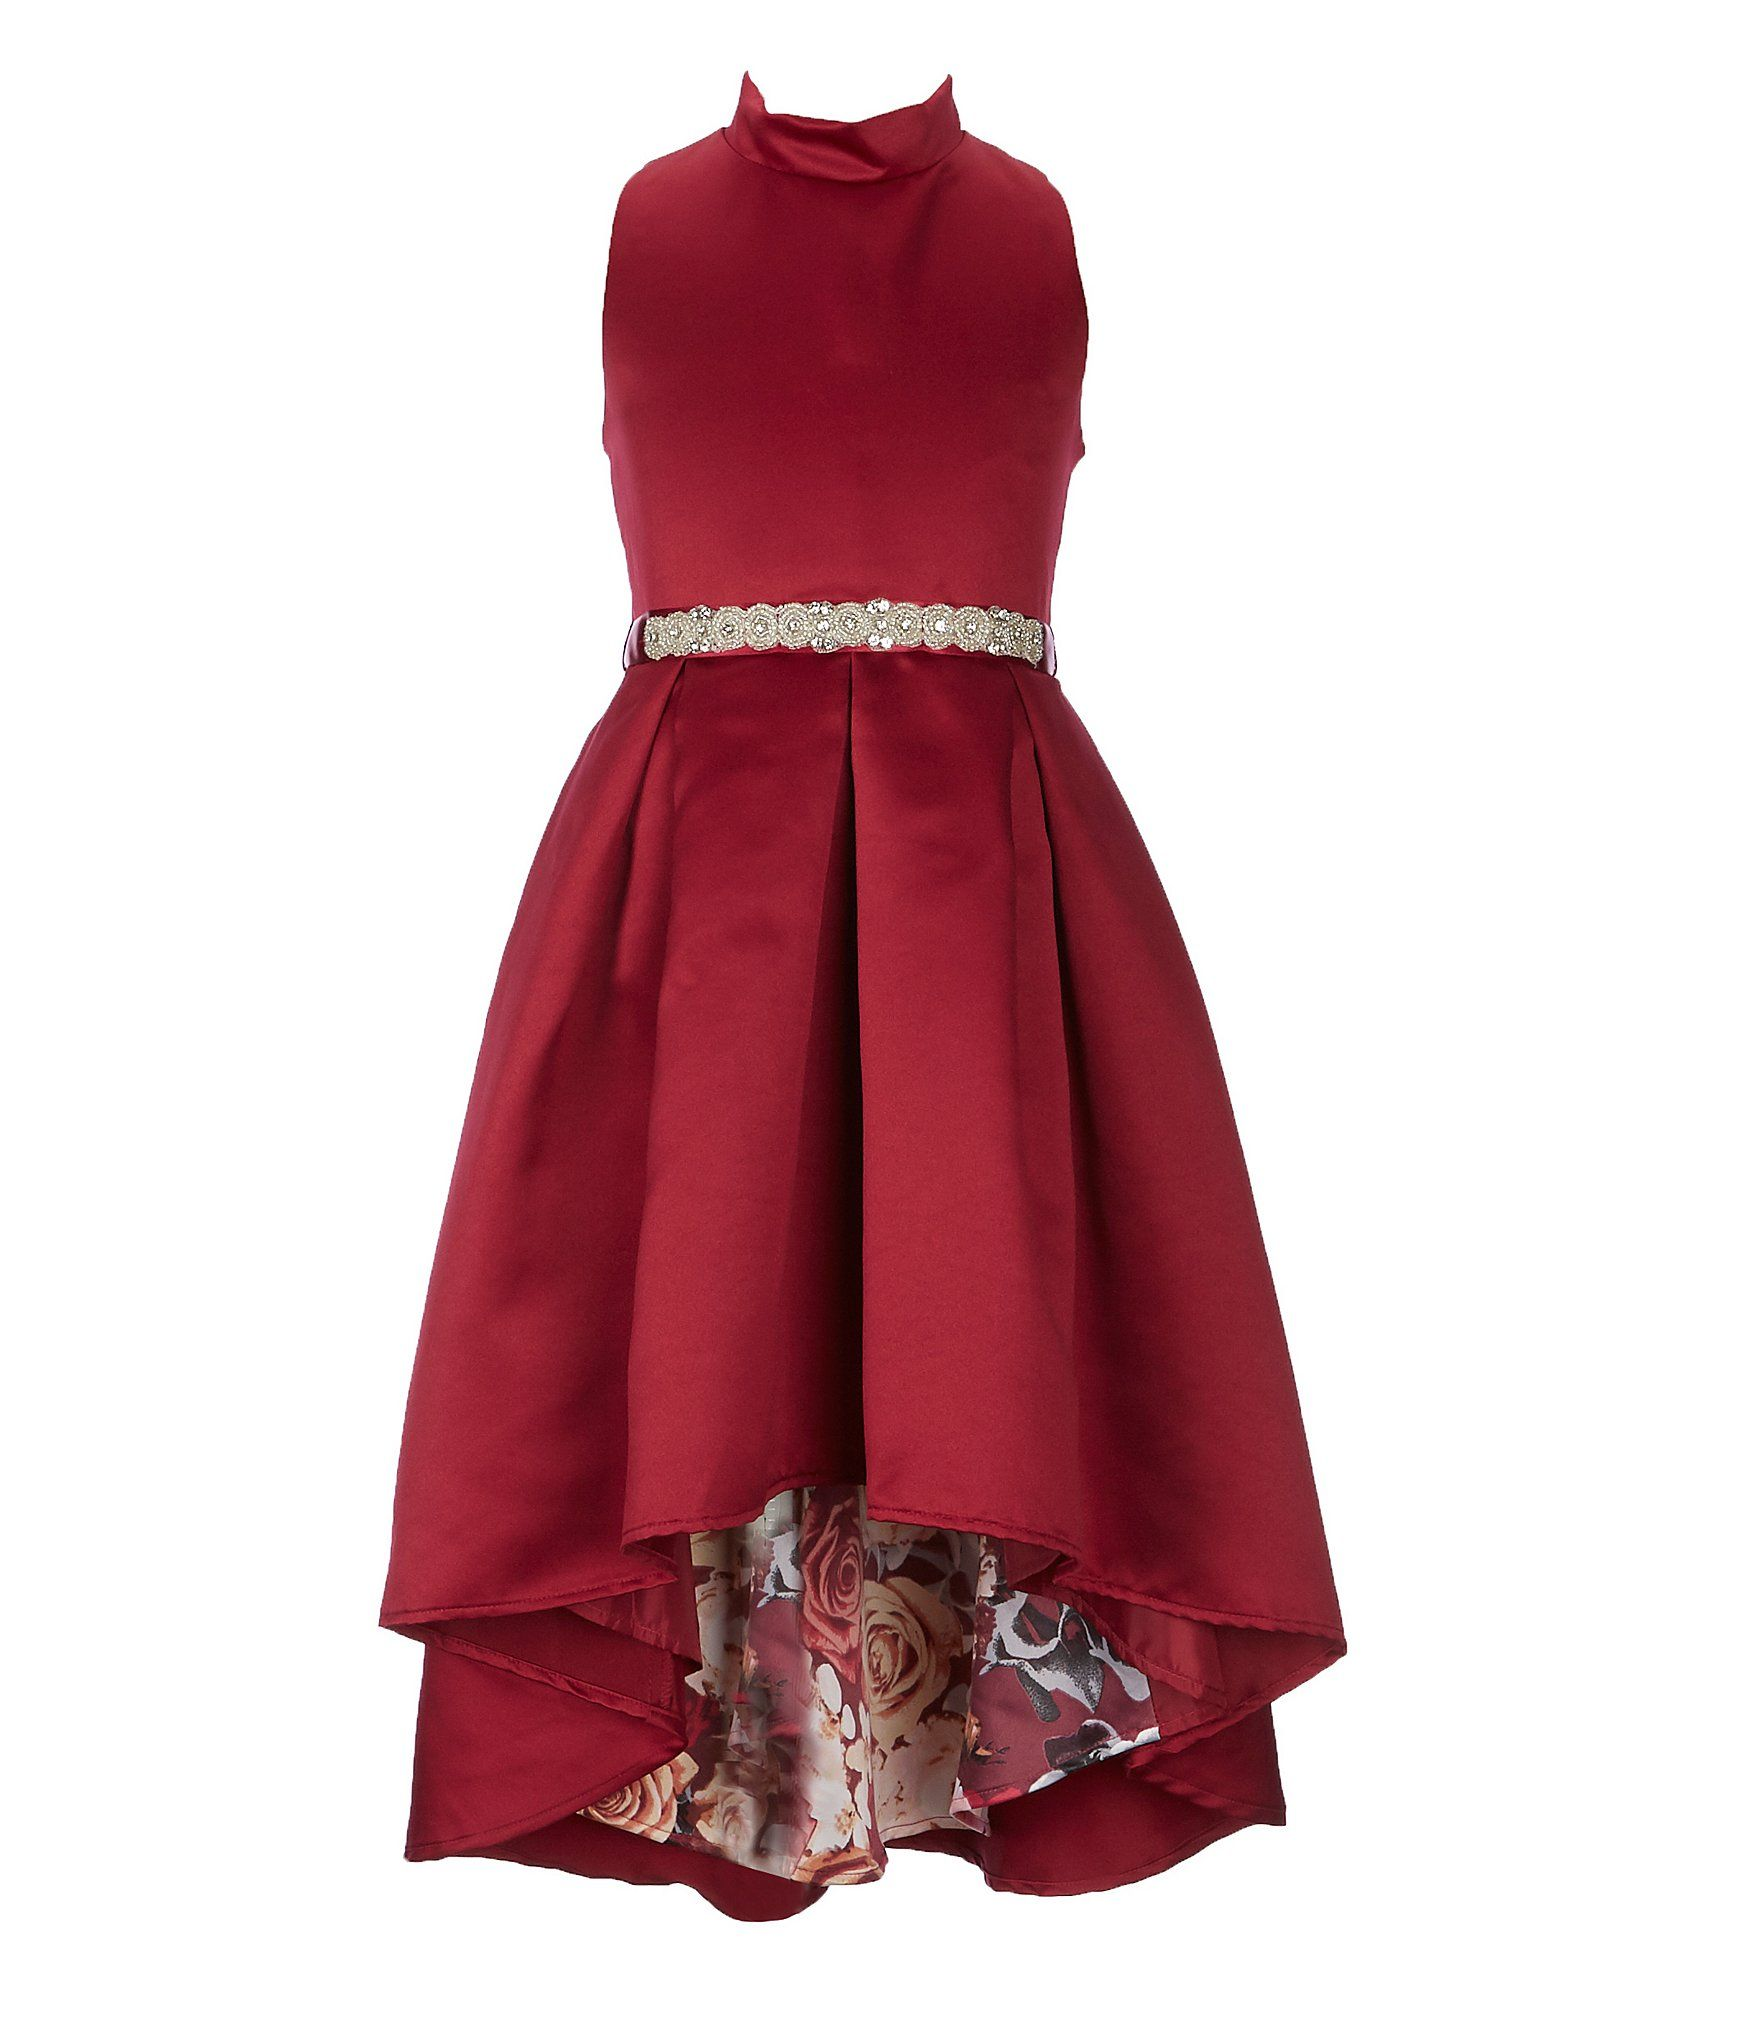 92f3f8853af Shop for Rare Editions Big Girls 7-16 Satin Floral Inner Beauty High-Low  Dress at Dillards.com. Visit Dillards.com to find clothing